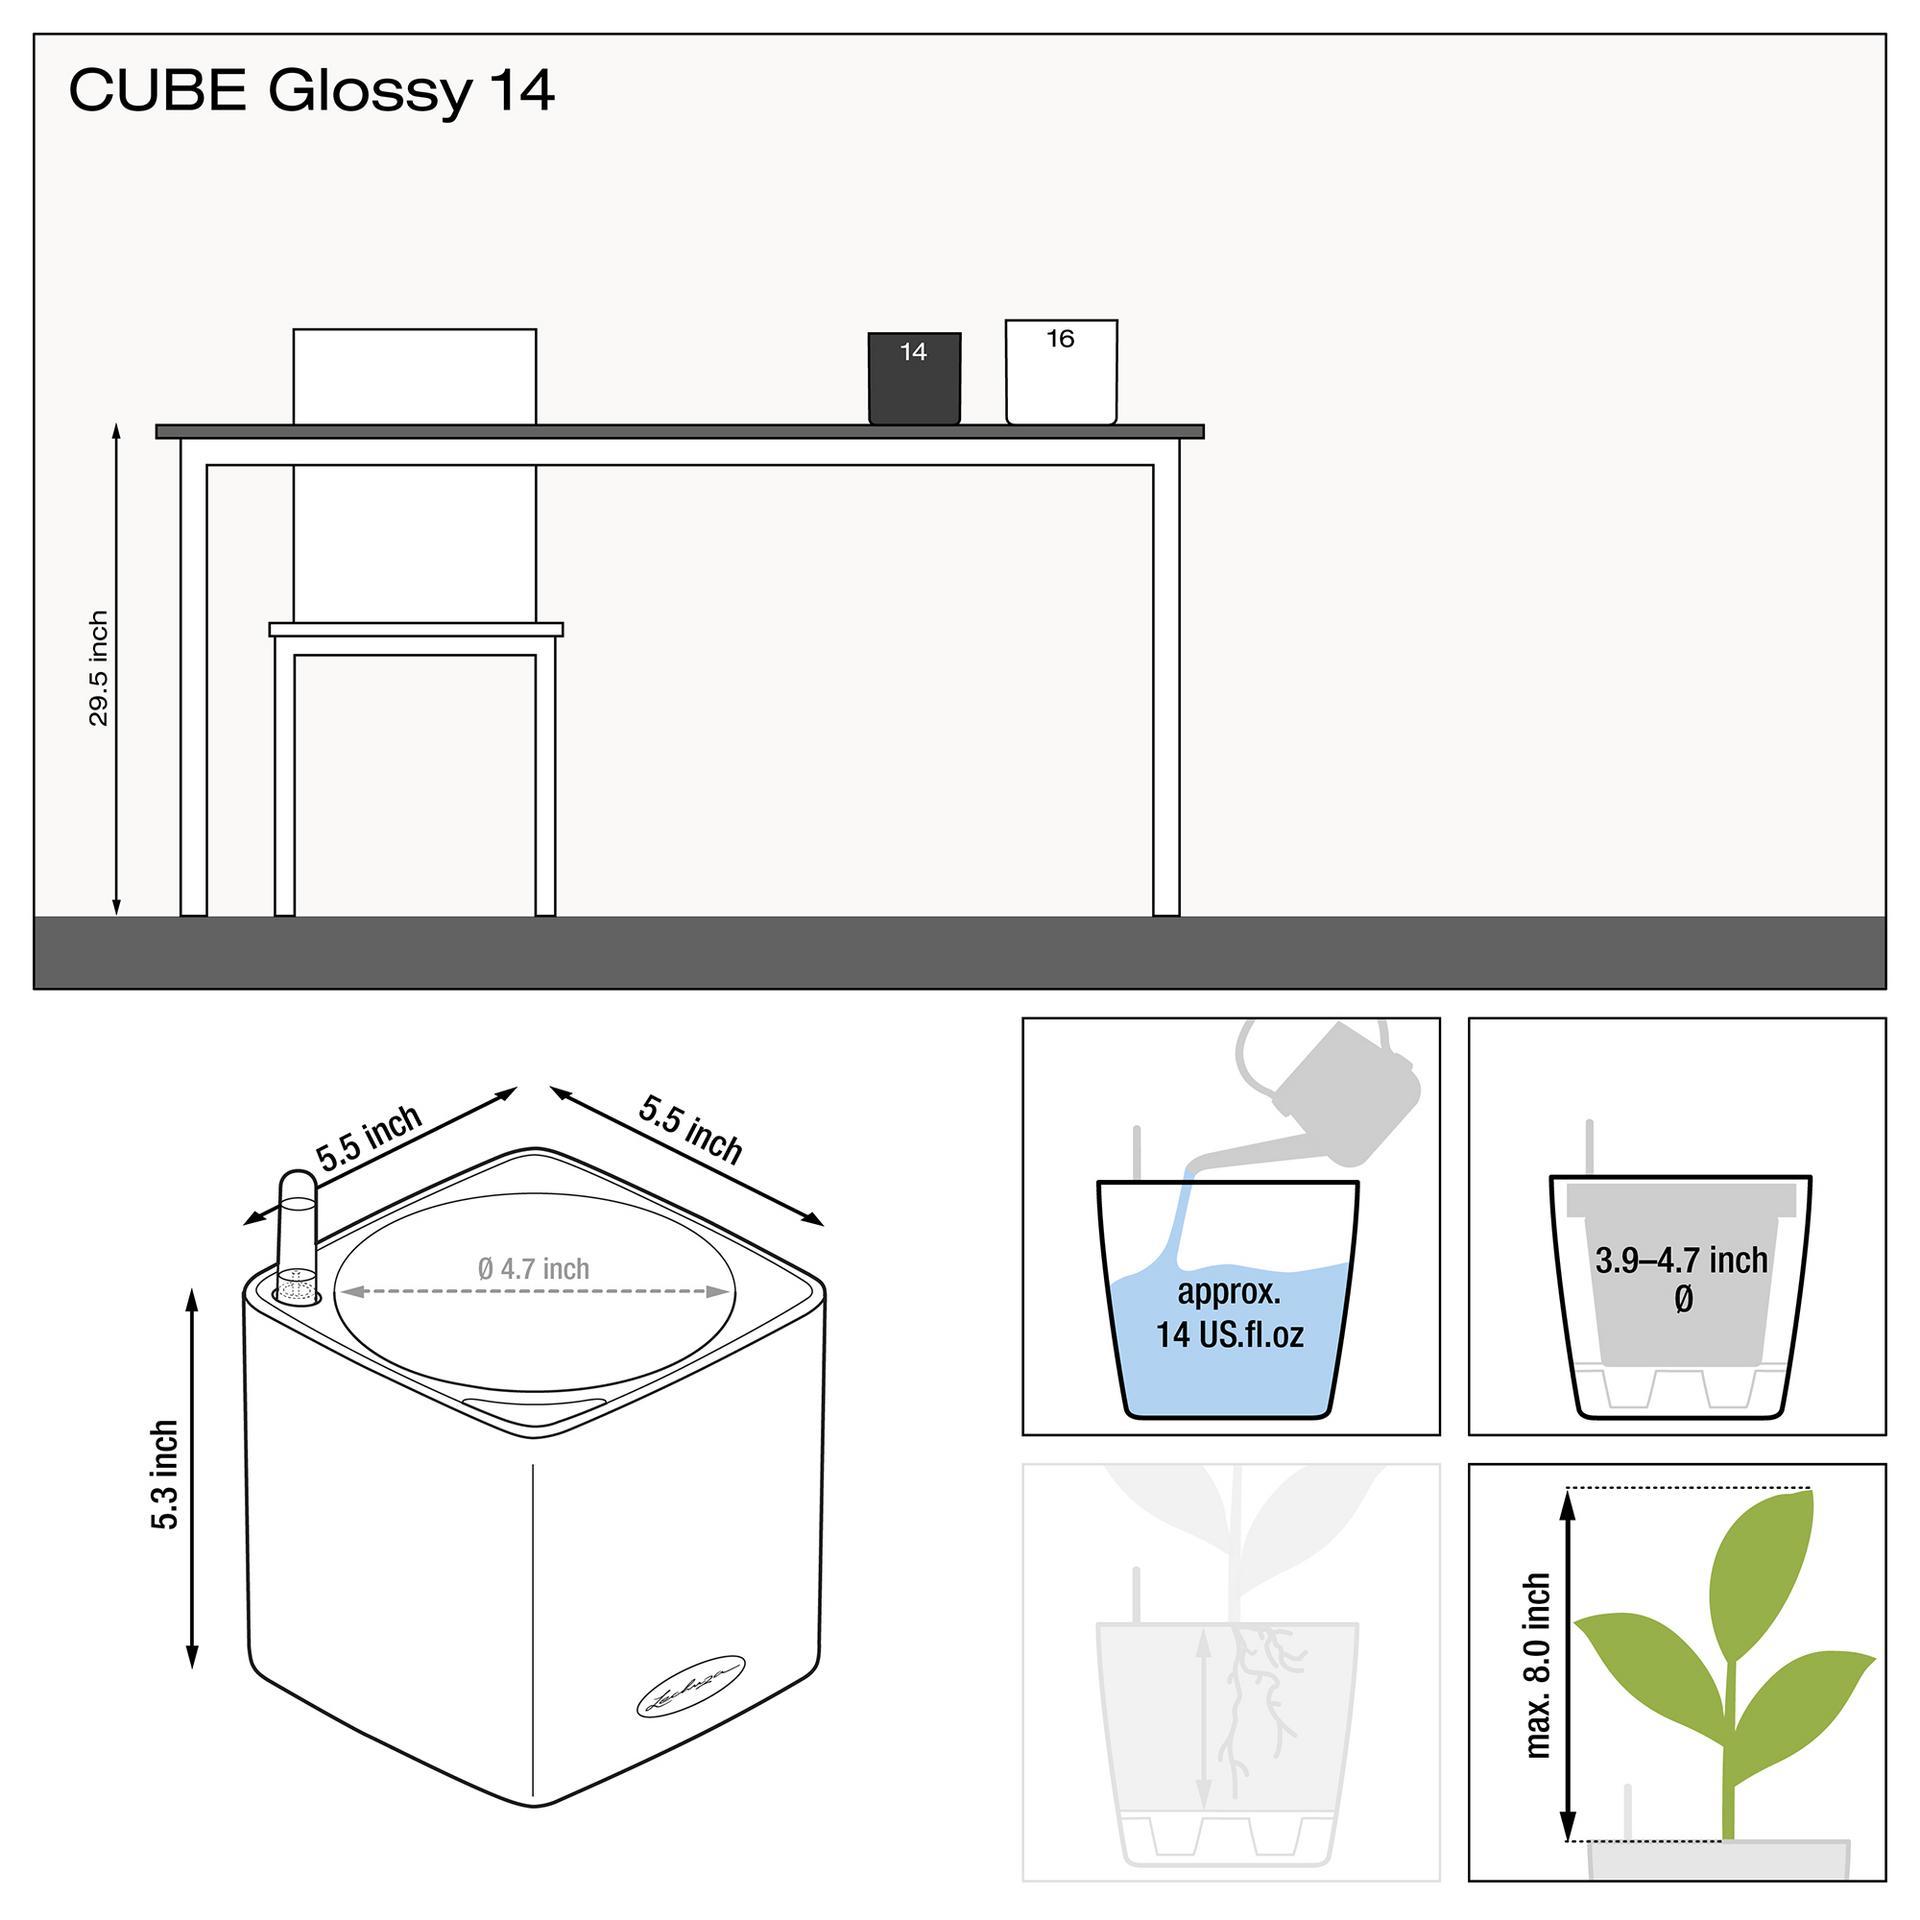 le_cube-glossy14_product_addi_nz_us